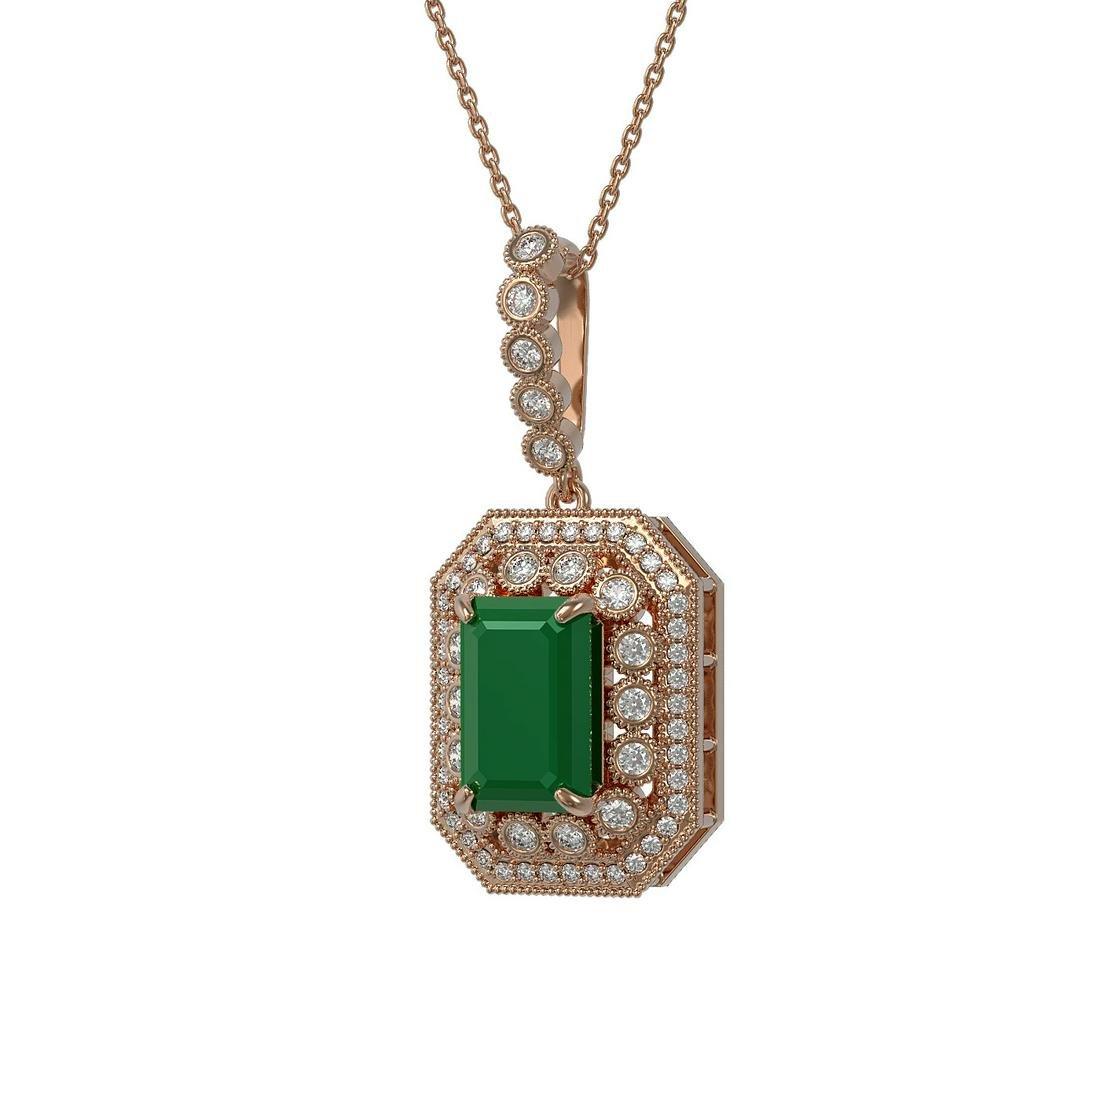 7.18 ctw Certified Emerald & Diamond Victorian Necklace